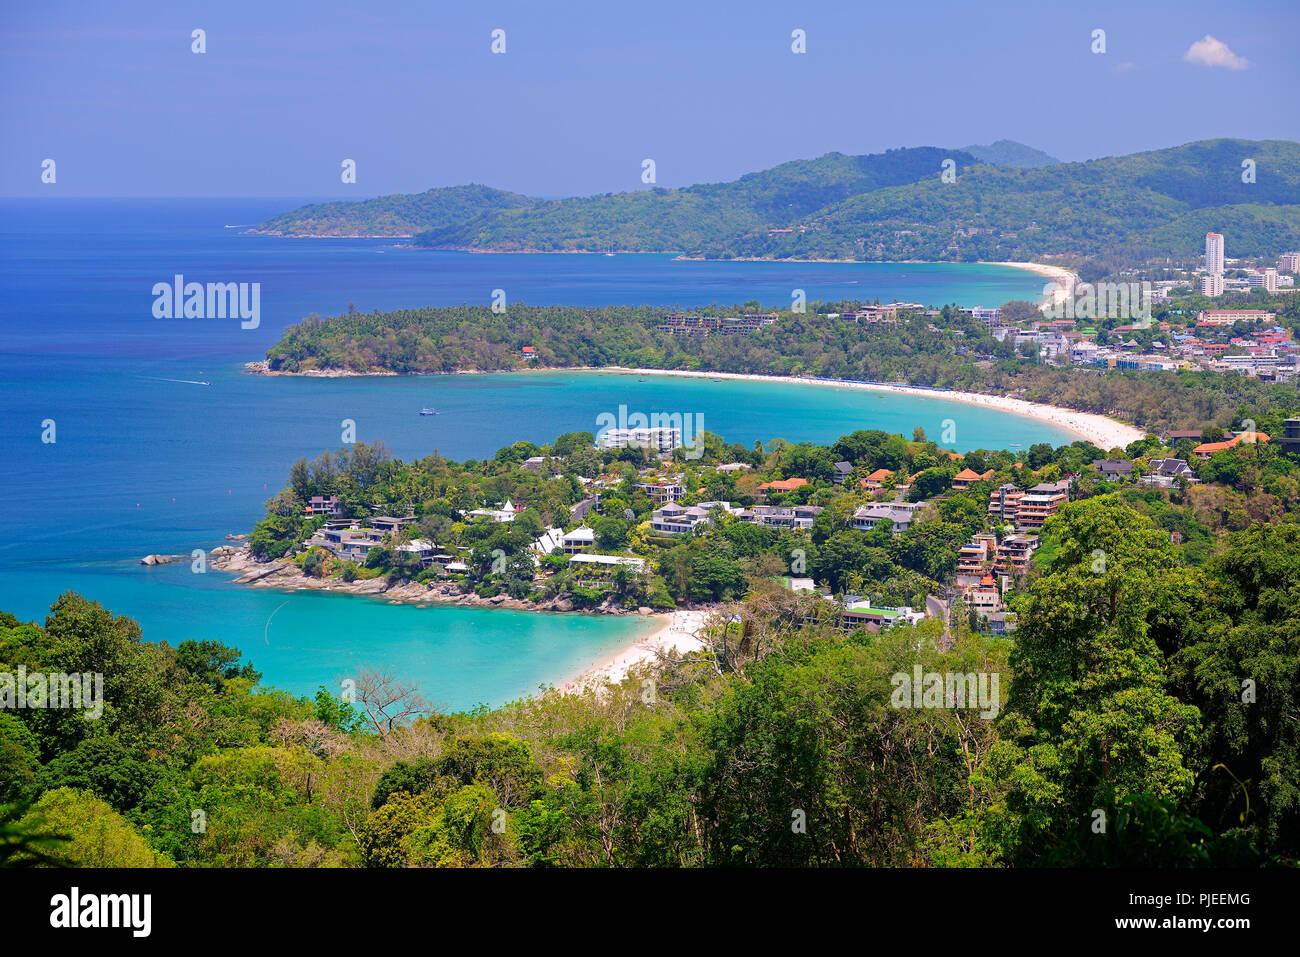 Look at Karon and Patong Beach of the Karon Viewpoint, Phuket, Thailand, Blick auf Karon und Patong Beach vom Karon Viewpoint - Stock Image